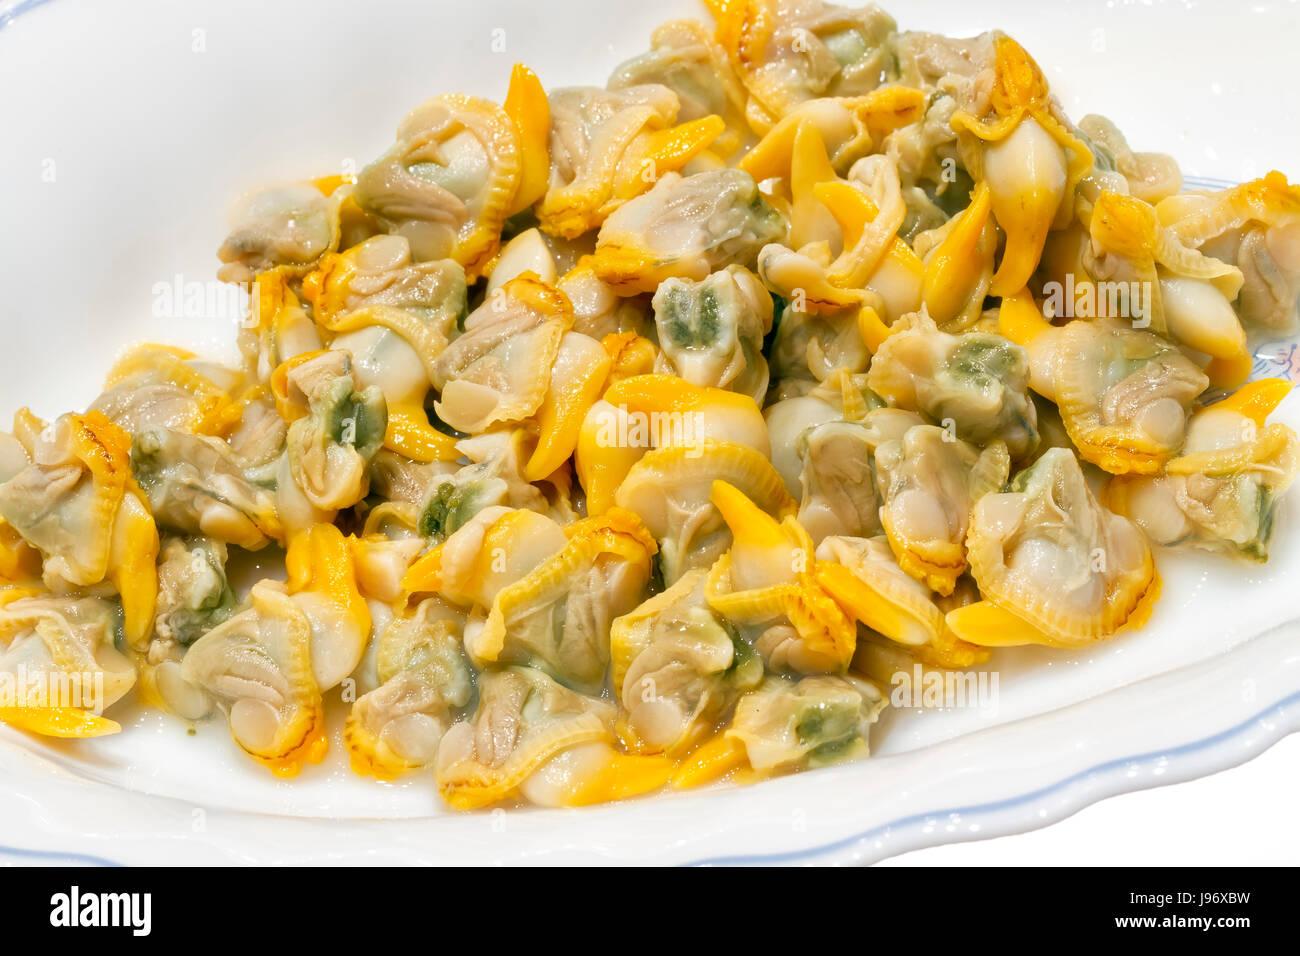 food, aliment, mollusc, shell, raw, seafood, edible, navy, marine, spanish, Stock Photo